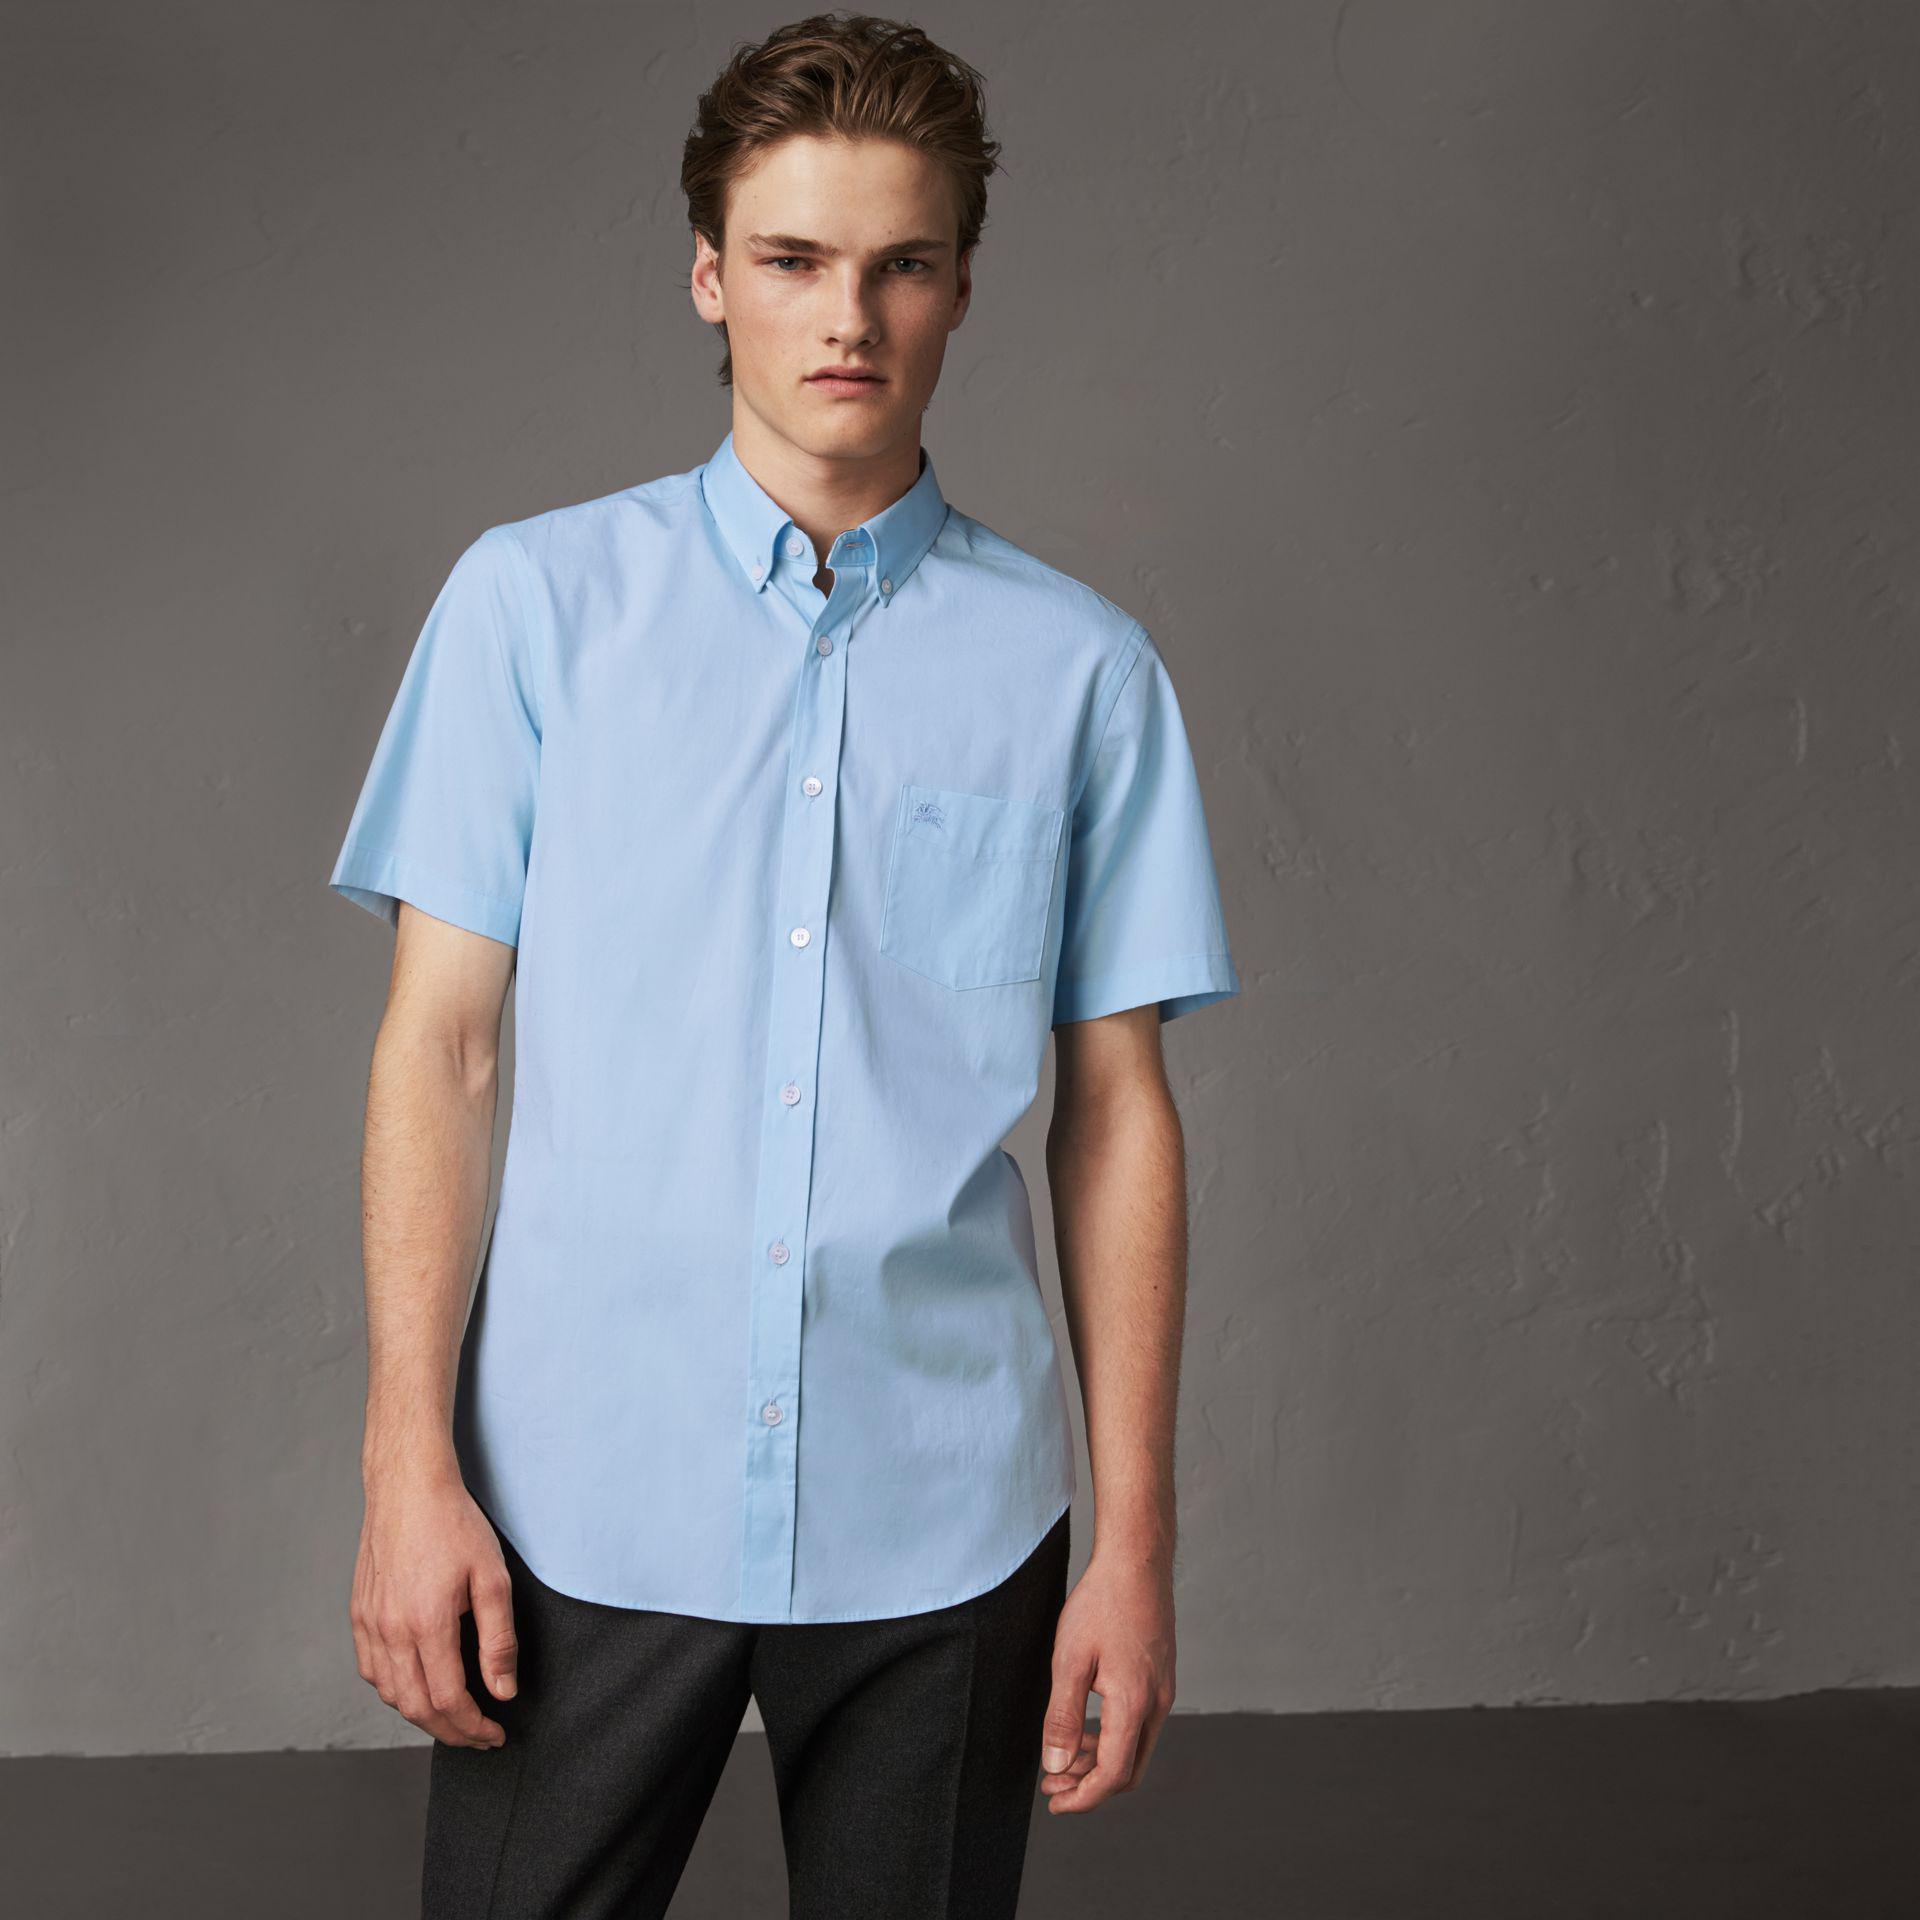 72998d180c3e Burberry Short-sleeved Stretch Cotton Poplin Shirt Pale Blue in Blue ...